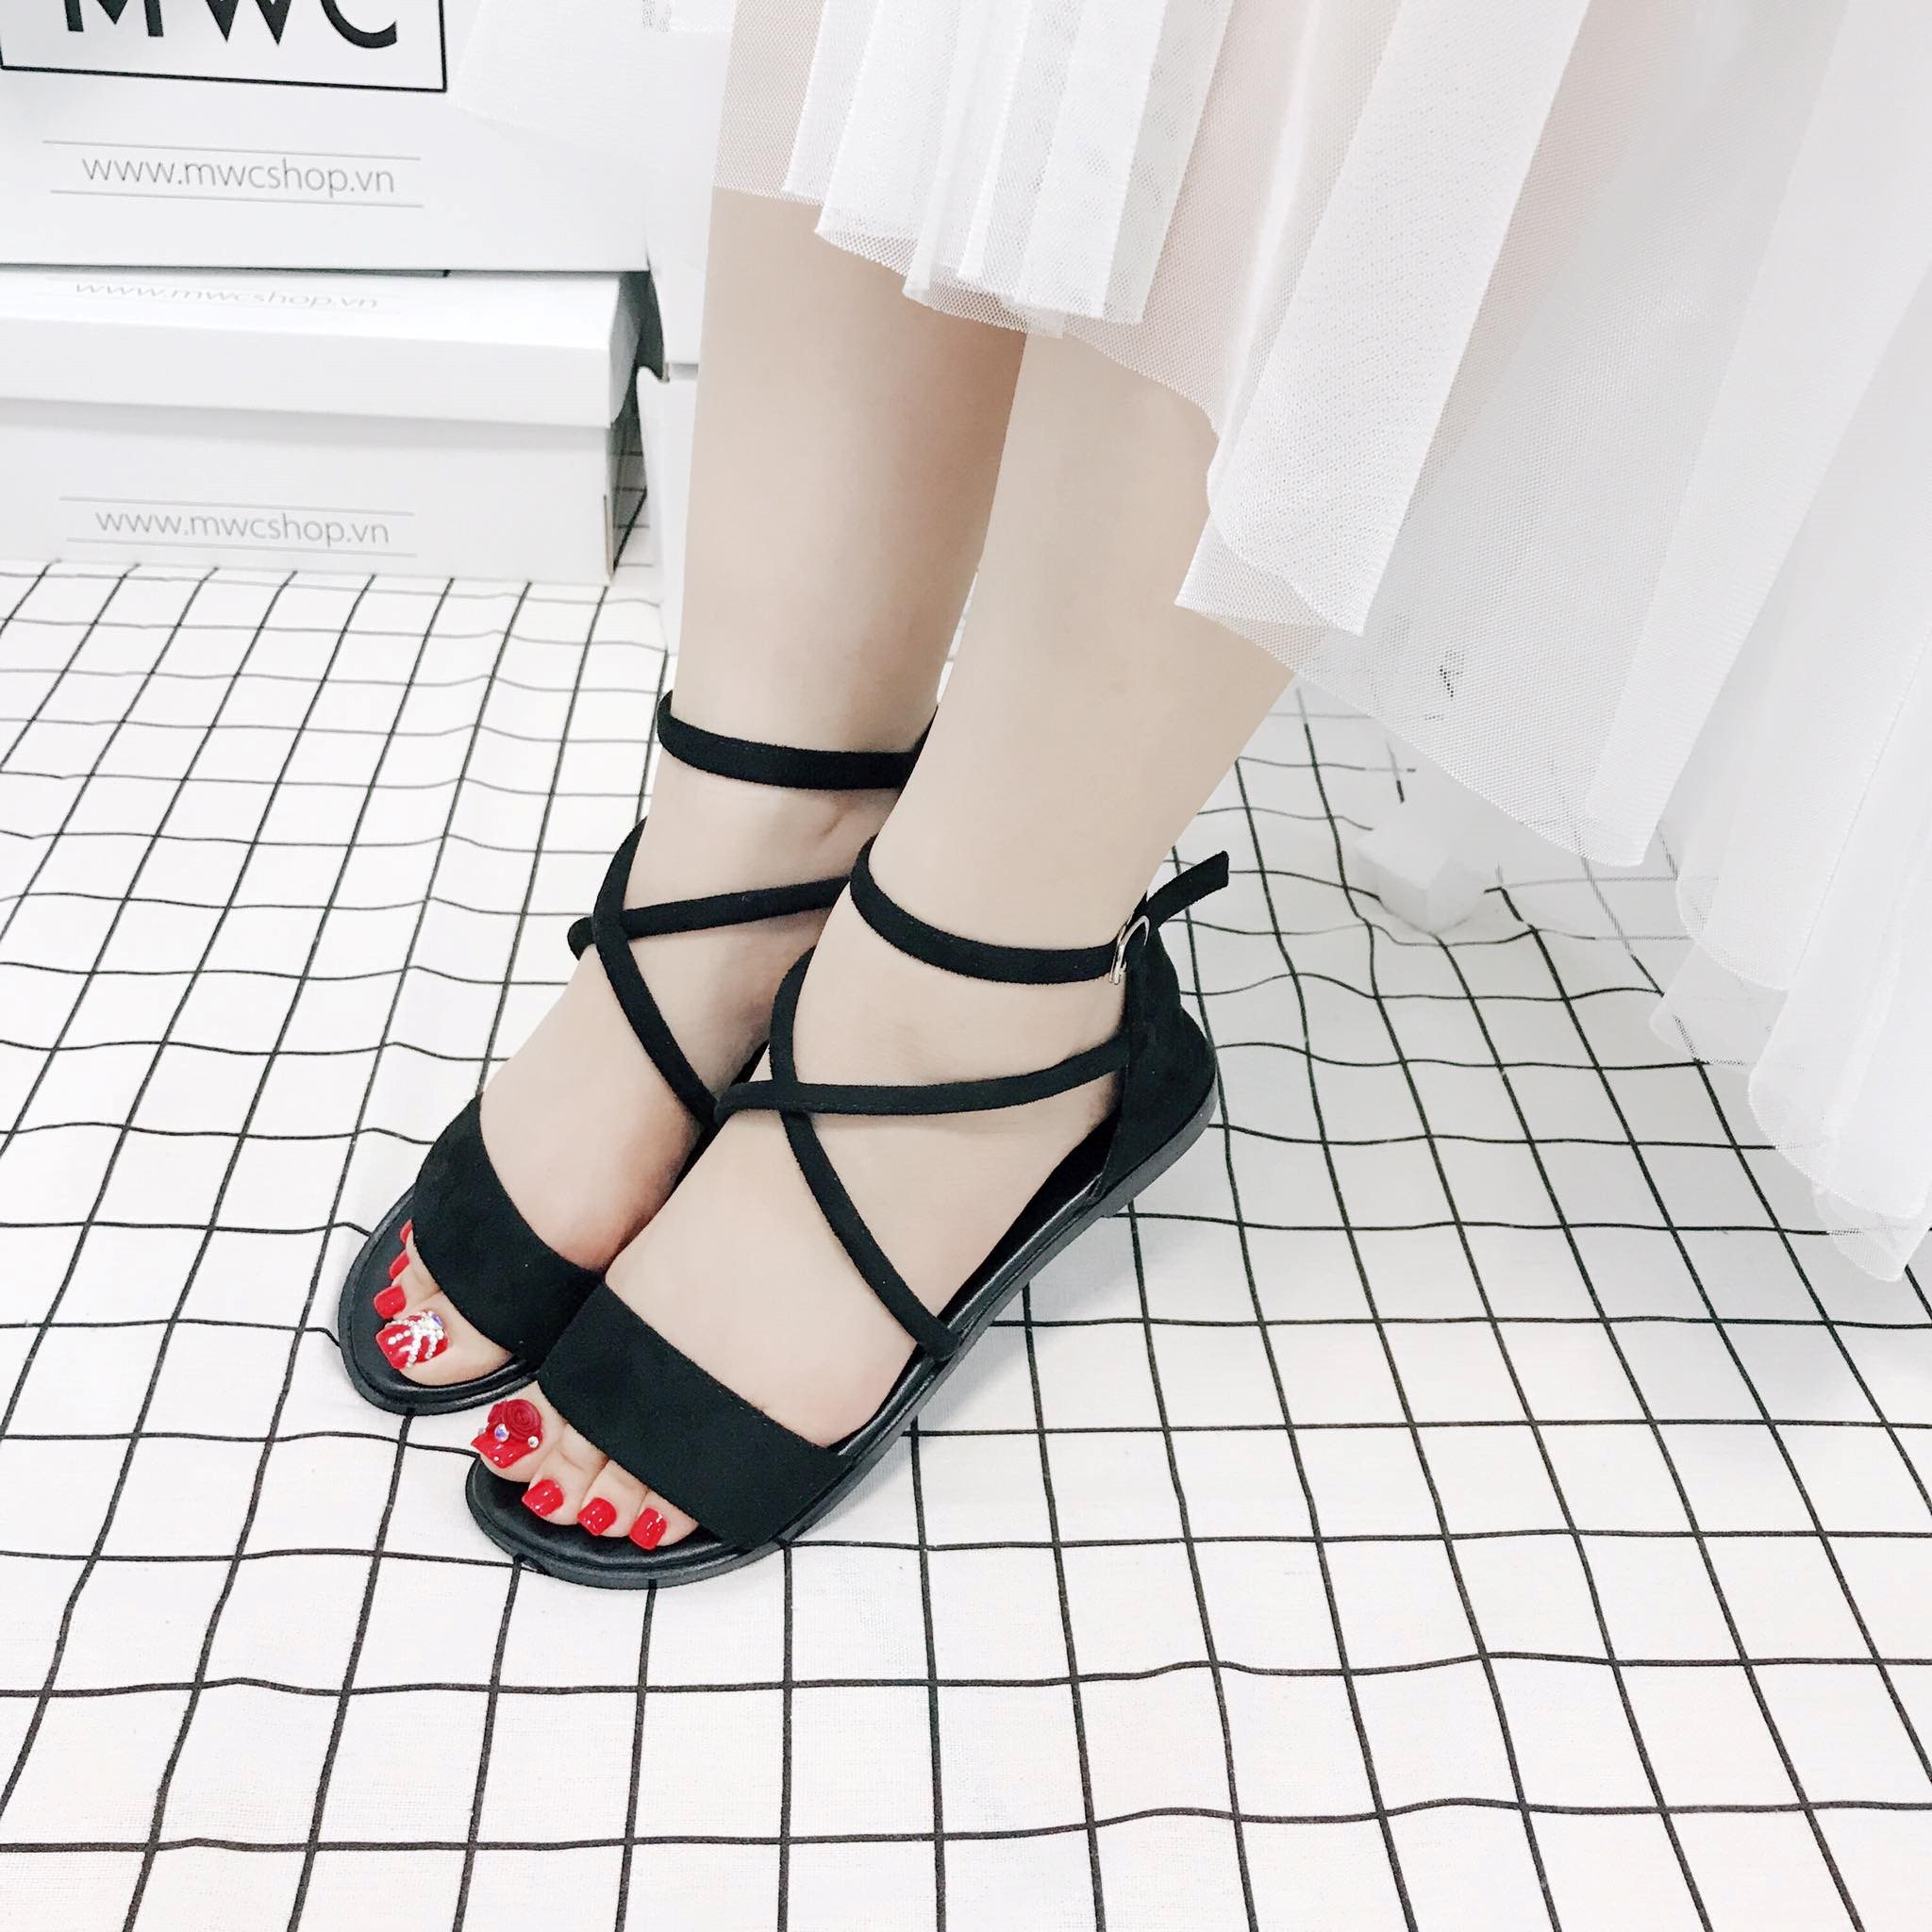 Giày sandal nữ MWC NUSD- 2509